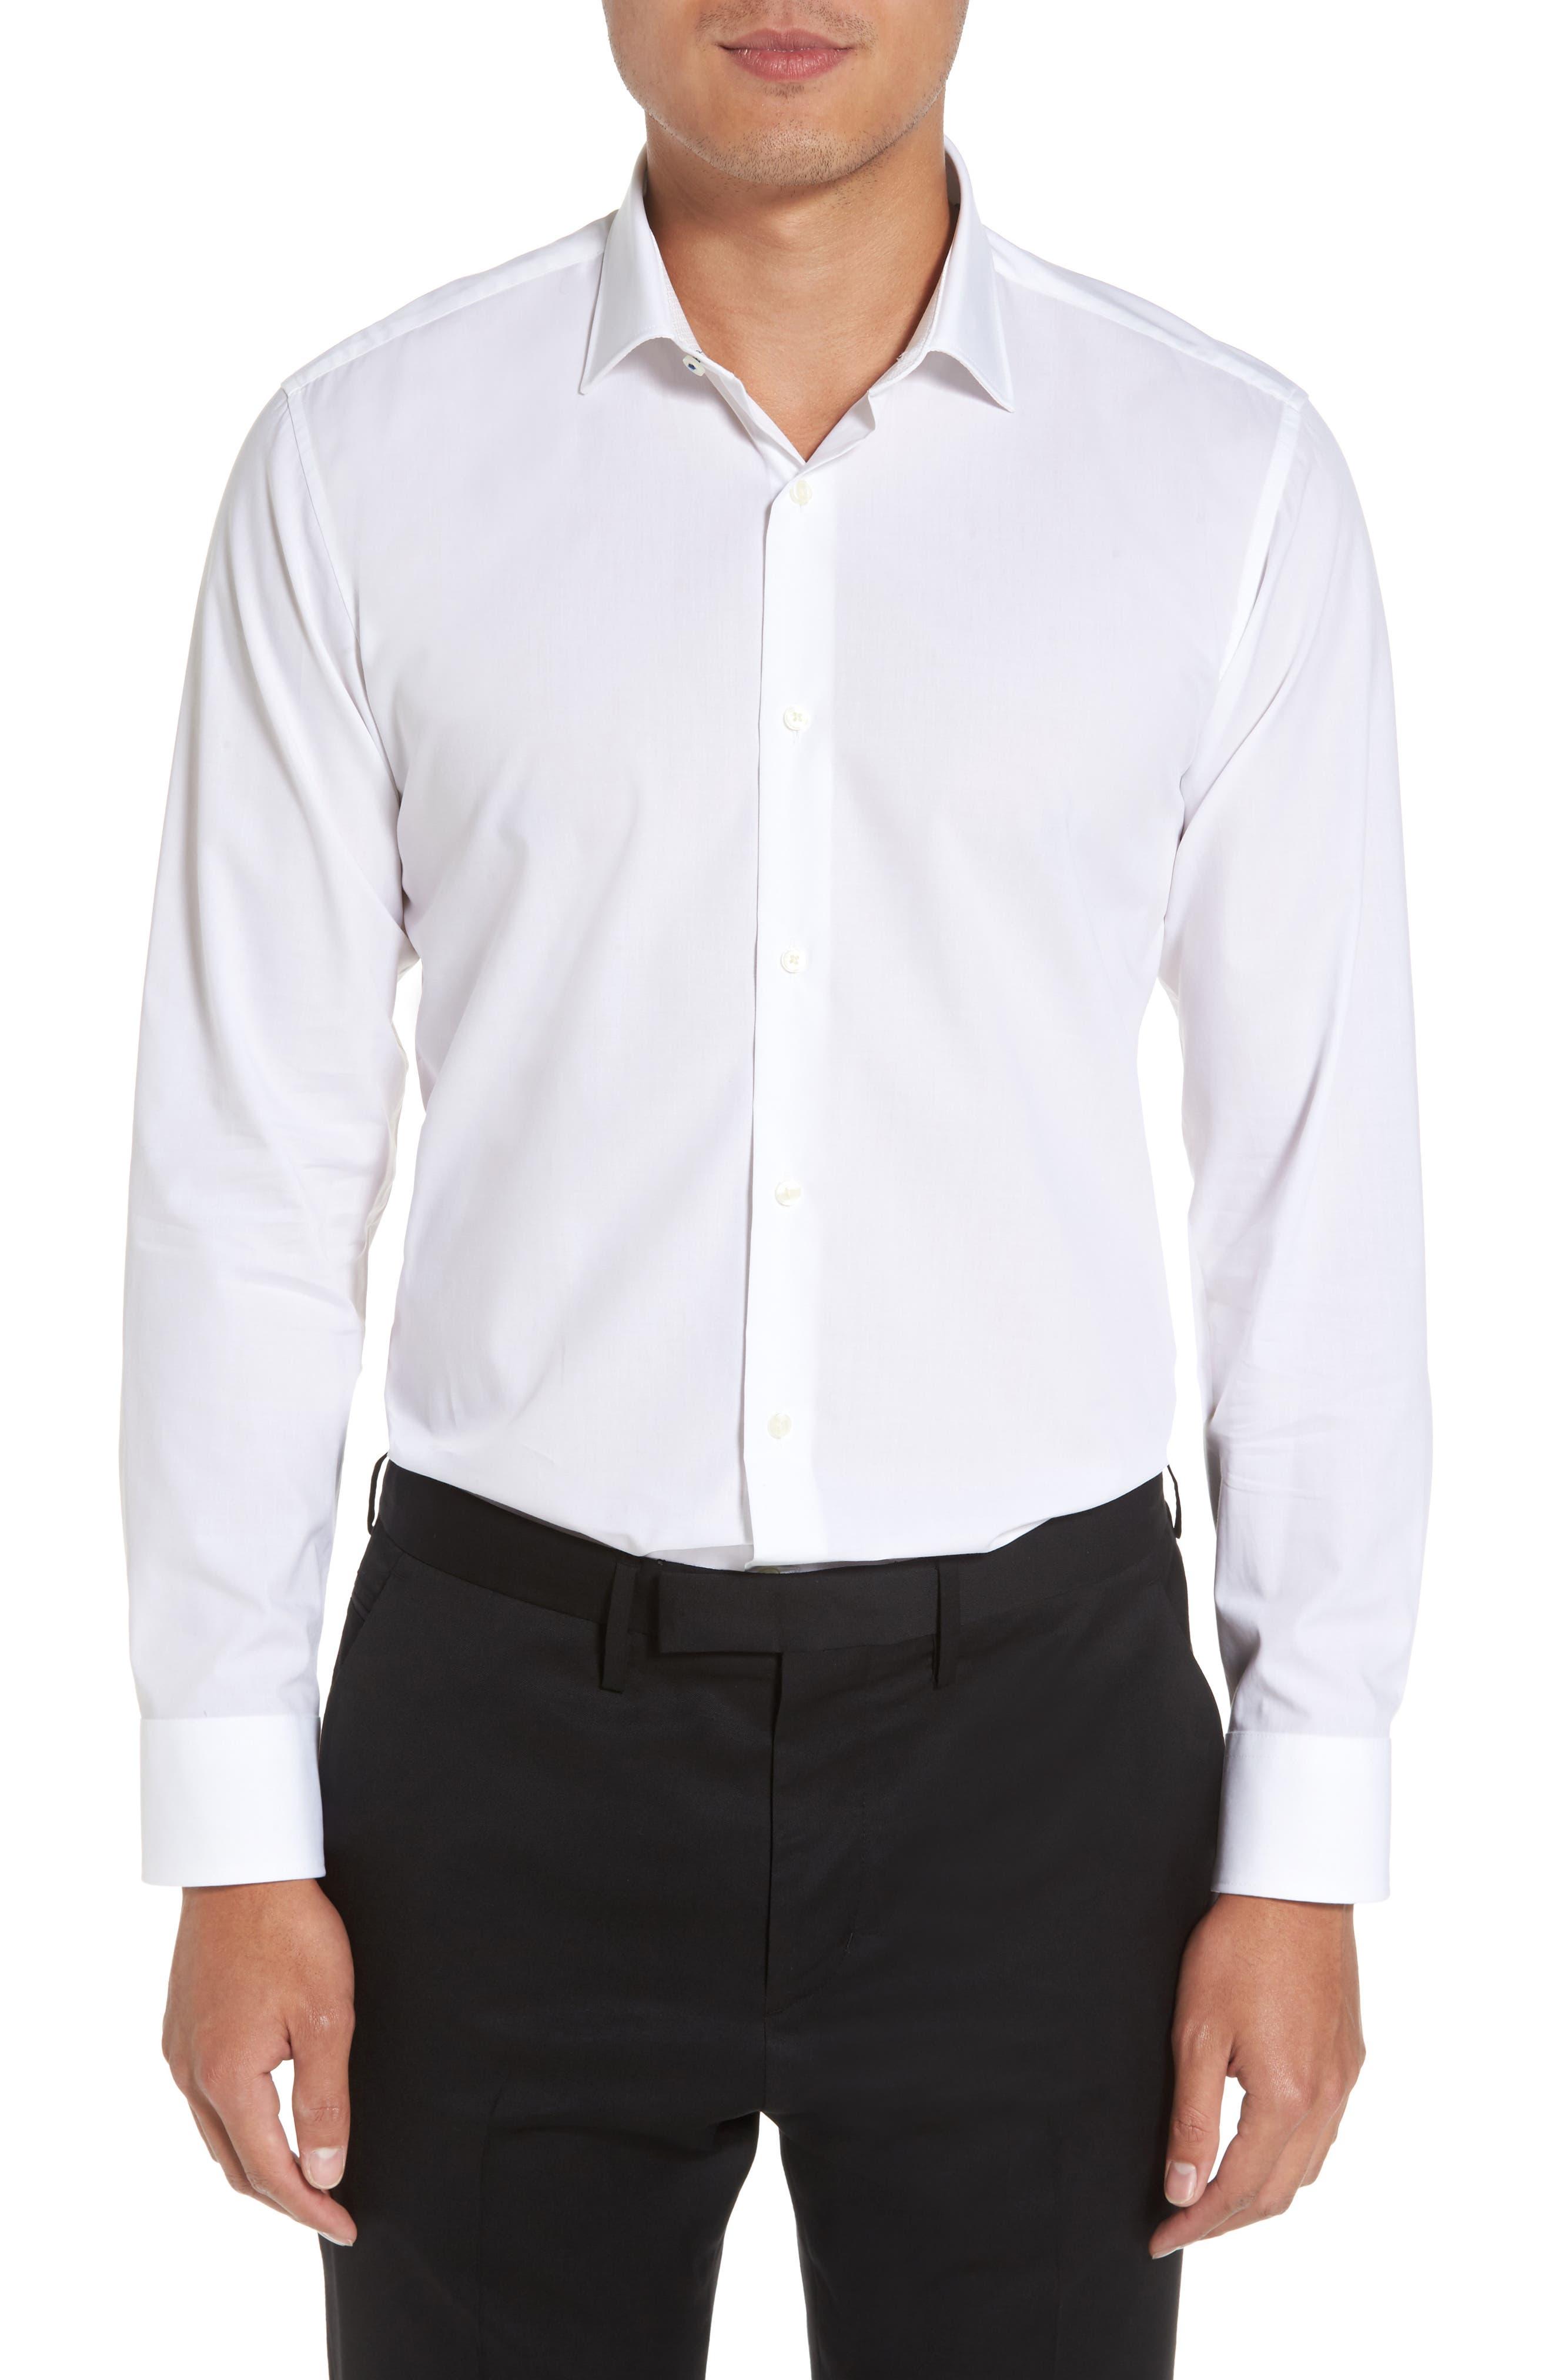 Booker Slim Fit Dress Shirt,                         Main,                         color, 110